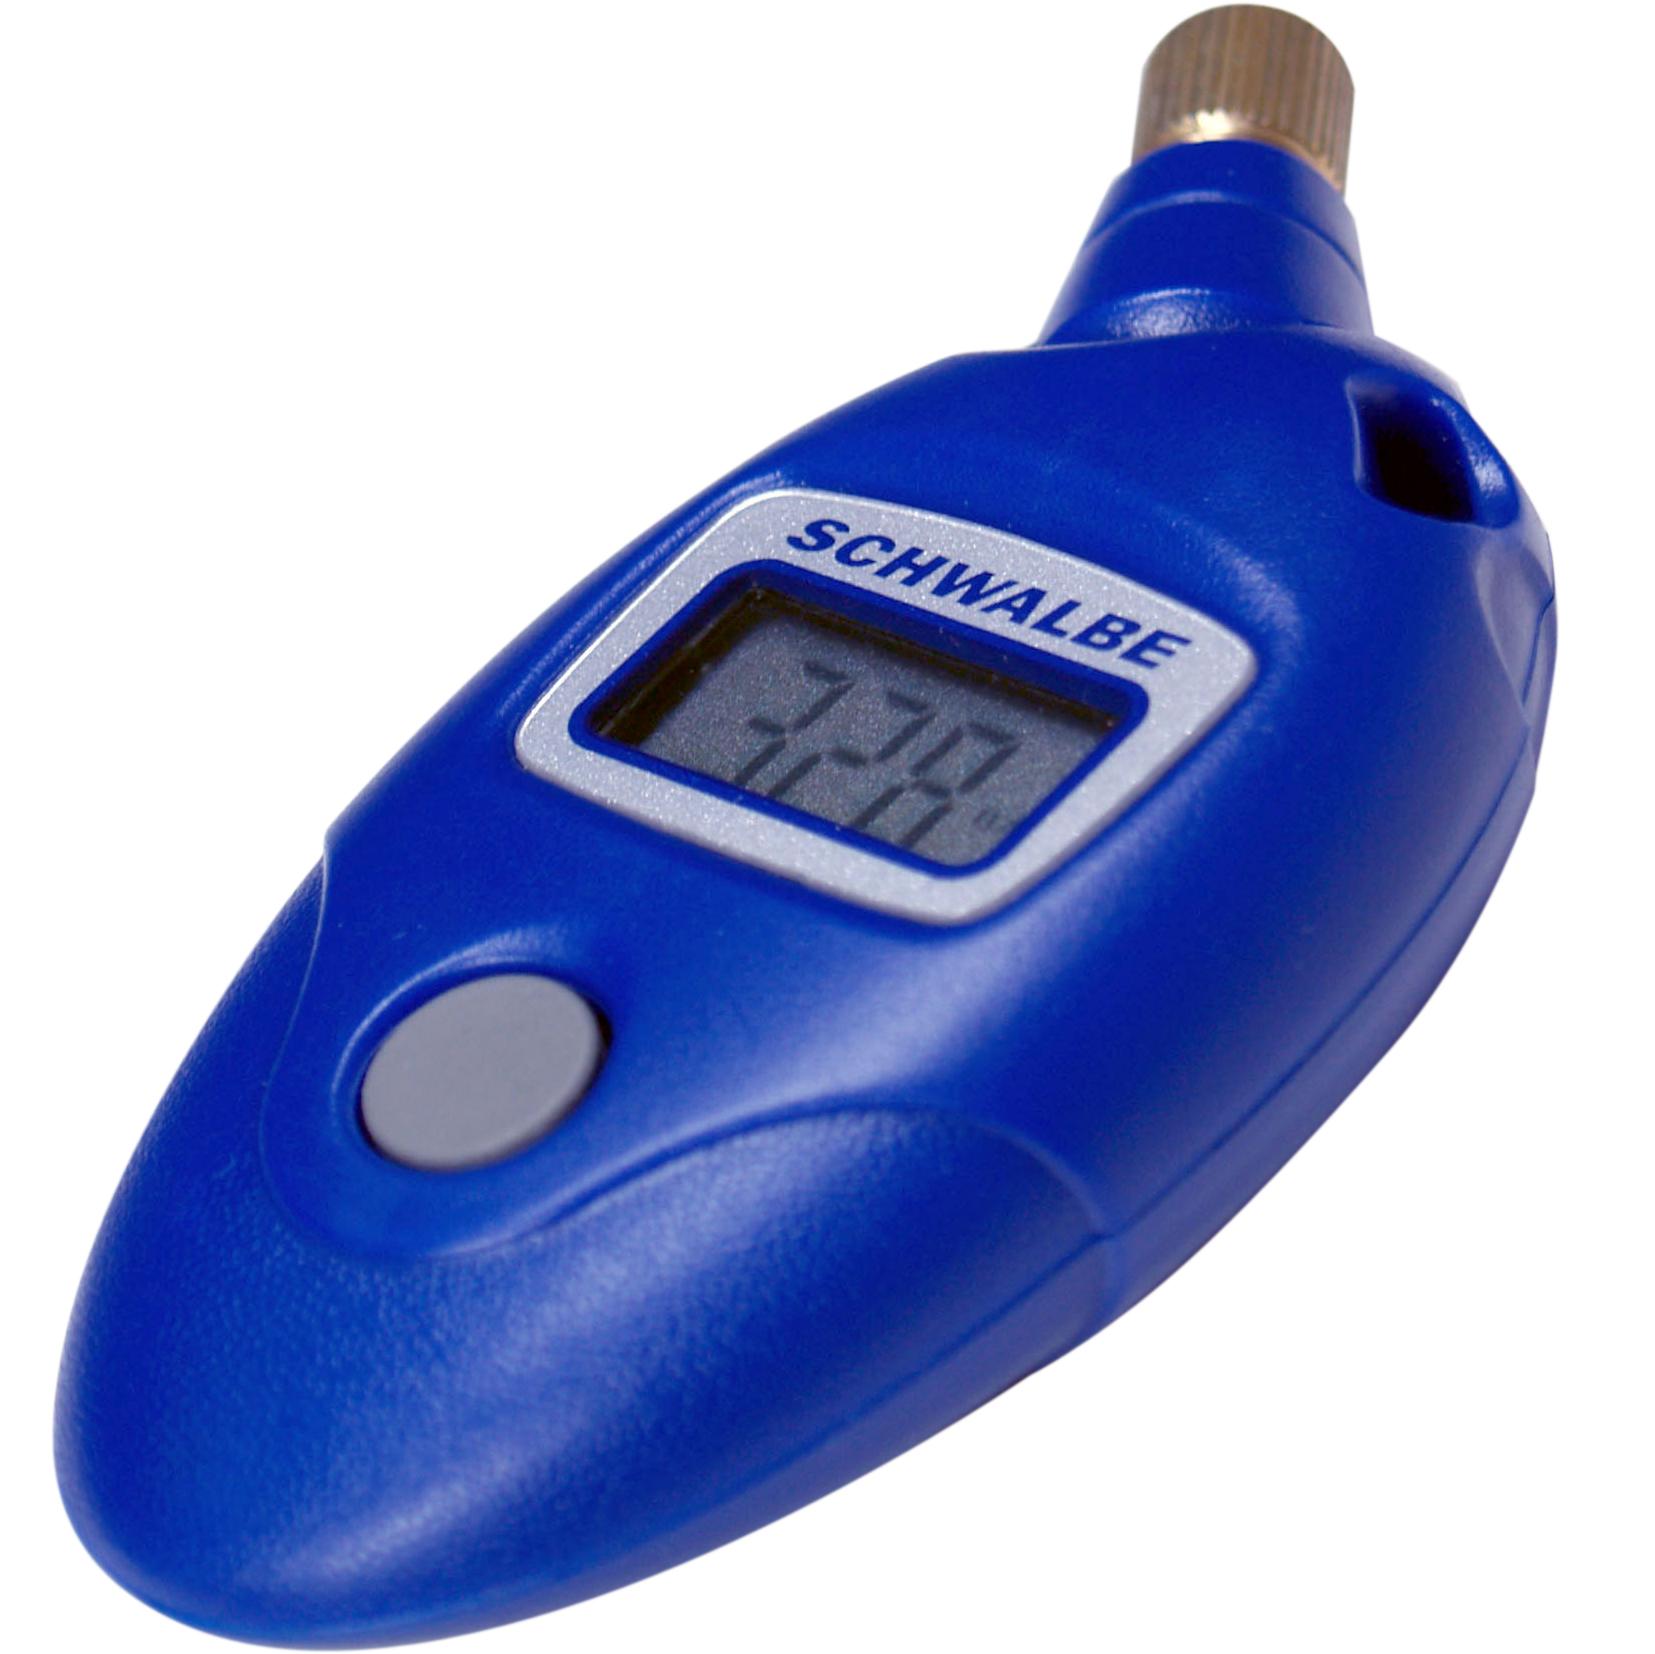 Schwalbe airmax pro digital pressure gauge thecheapjerseys Choice Image